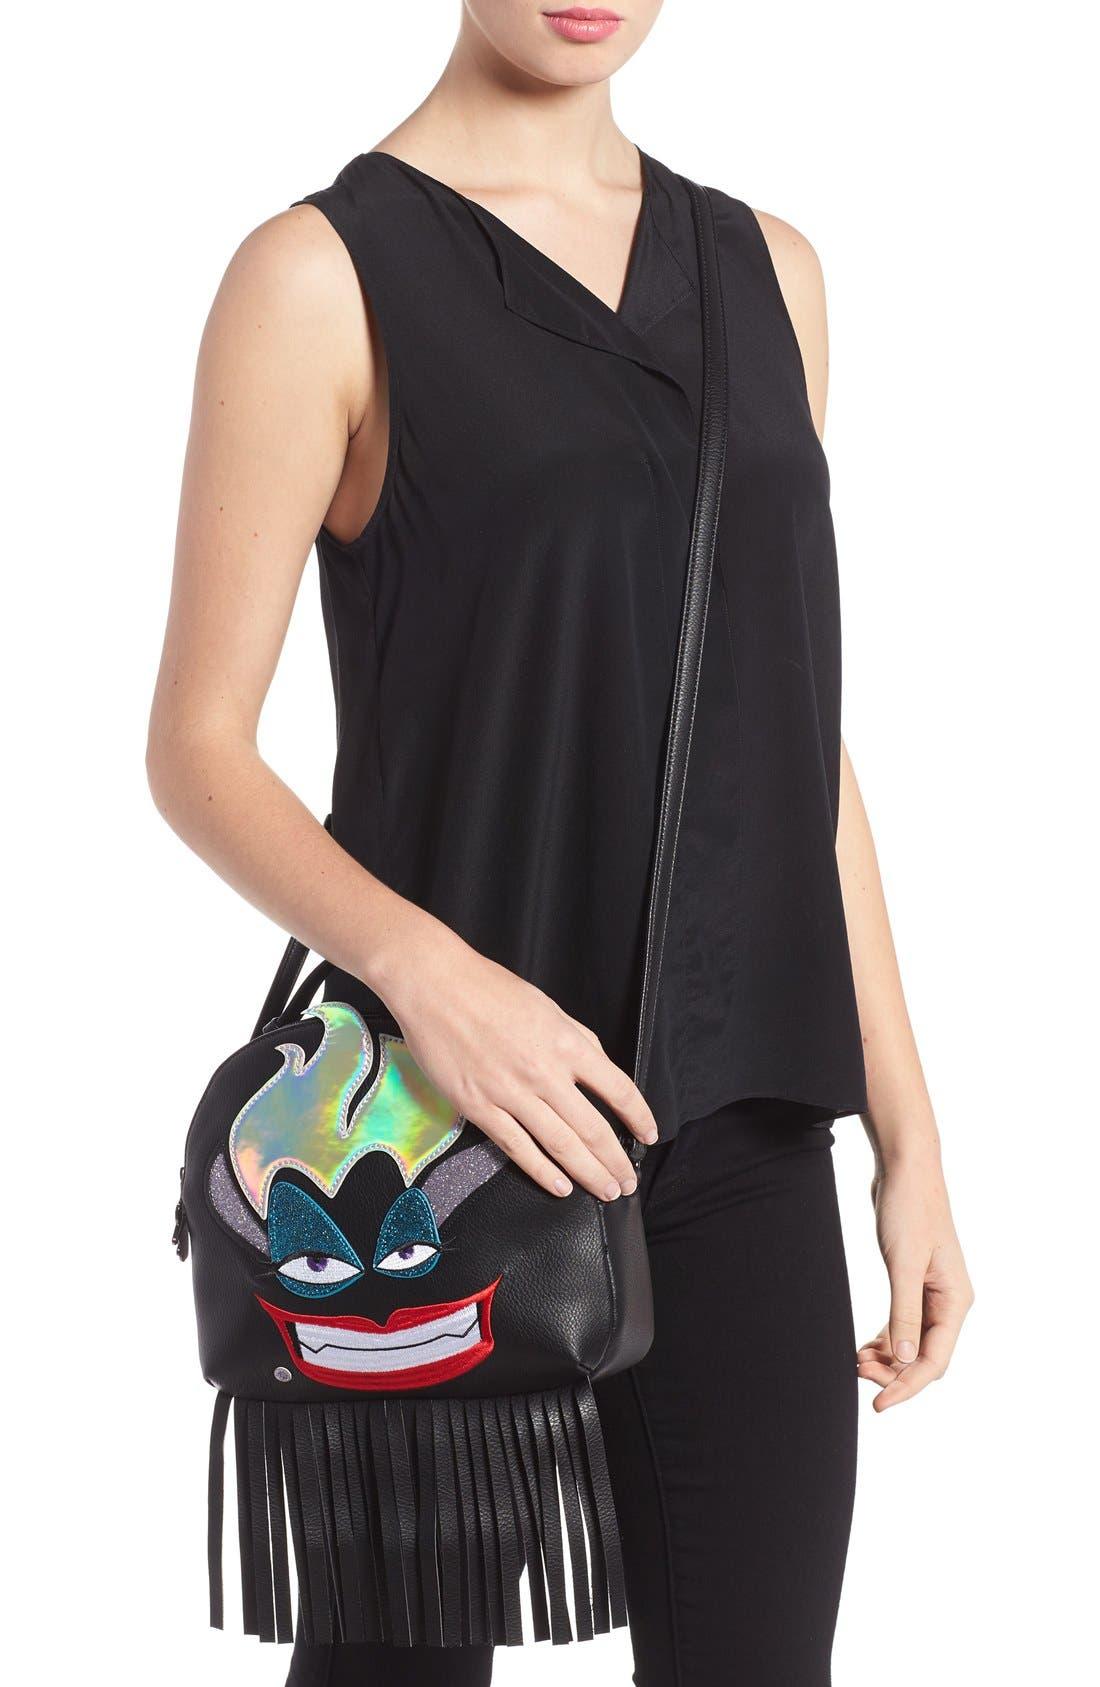 DANIELLE NICOLE,                             x Disney<sup>®</sup> Ursula Faux Leather Crossbody Bag,                             Alternate thumbnail 4, color,                             001